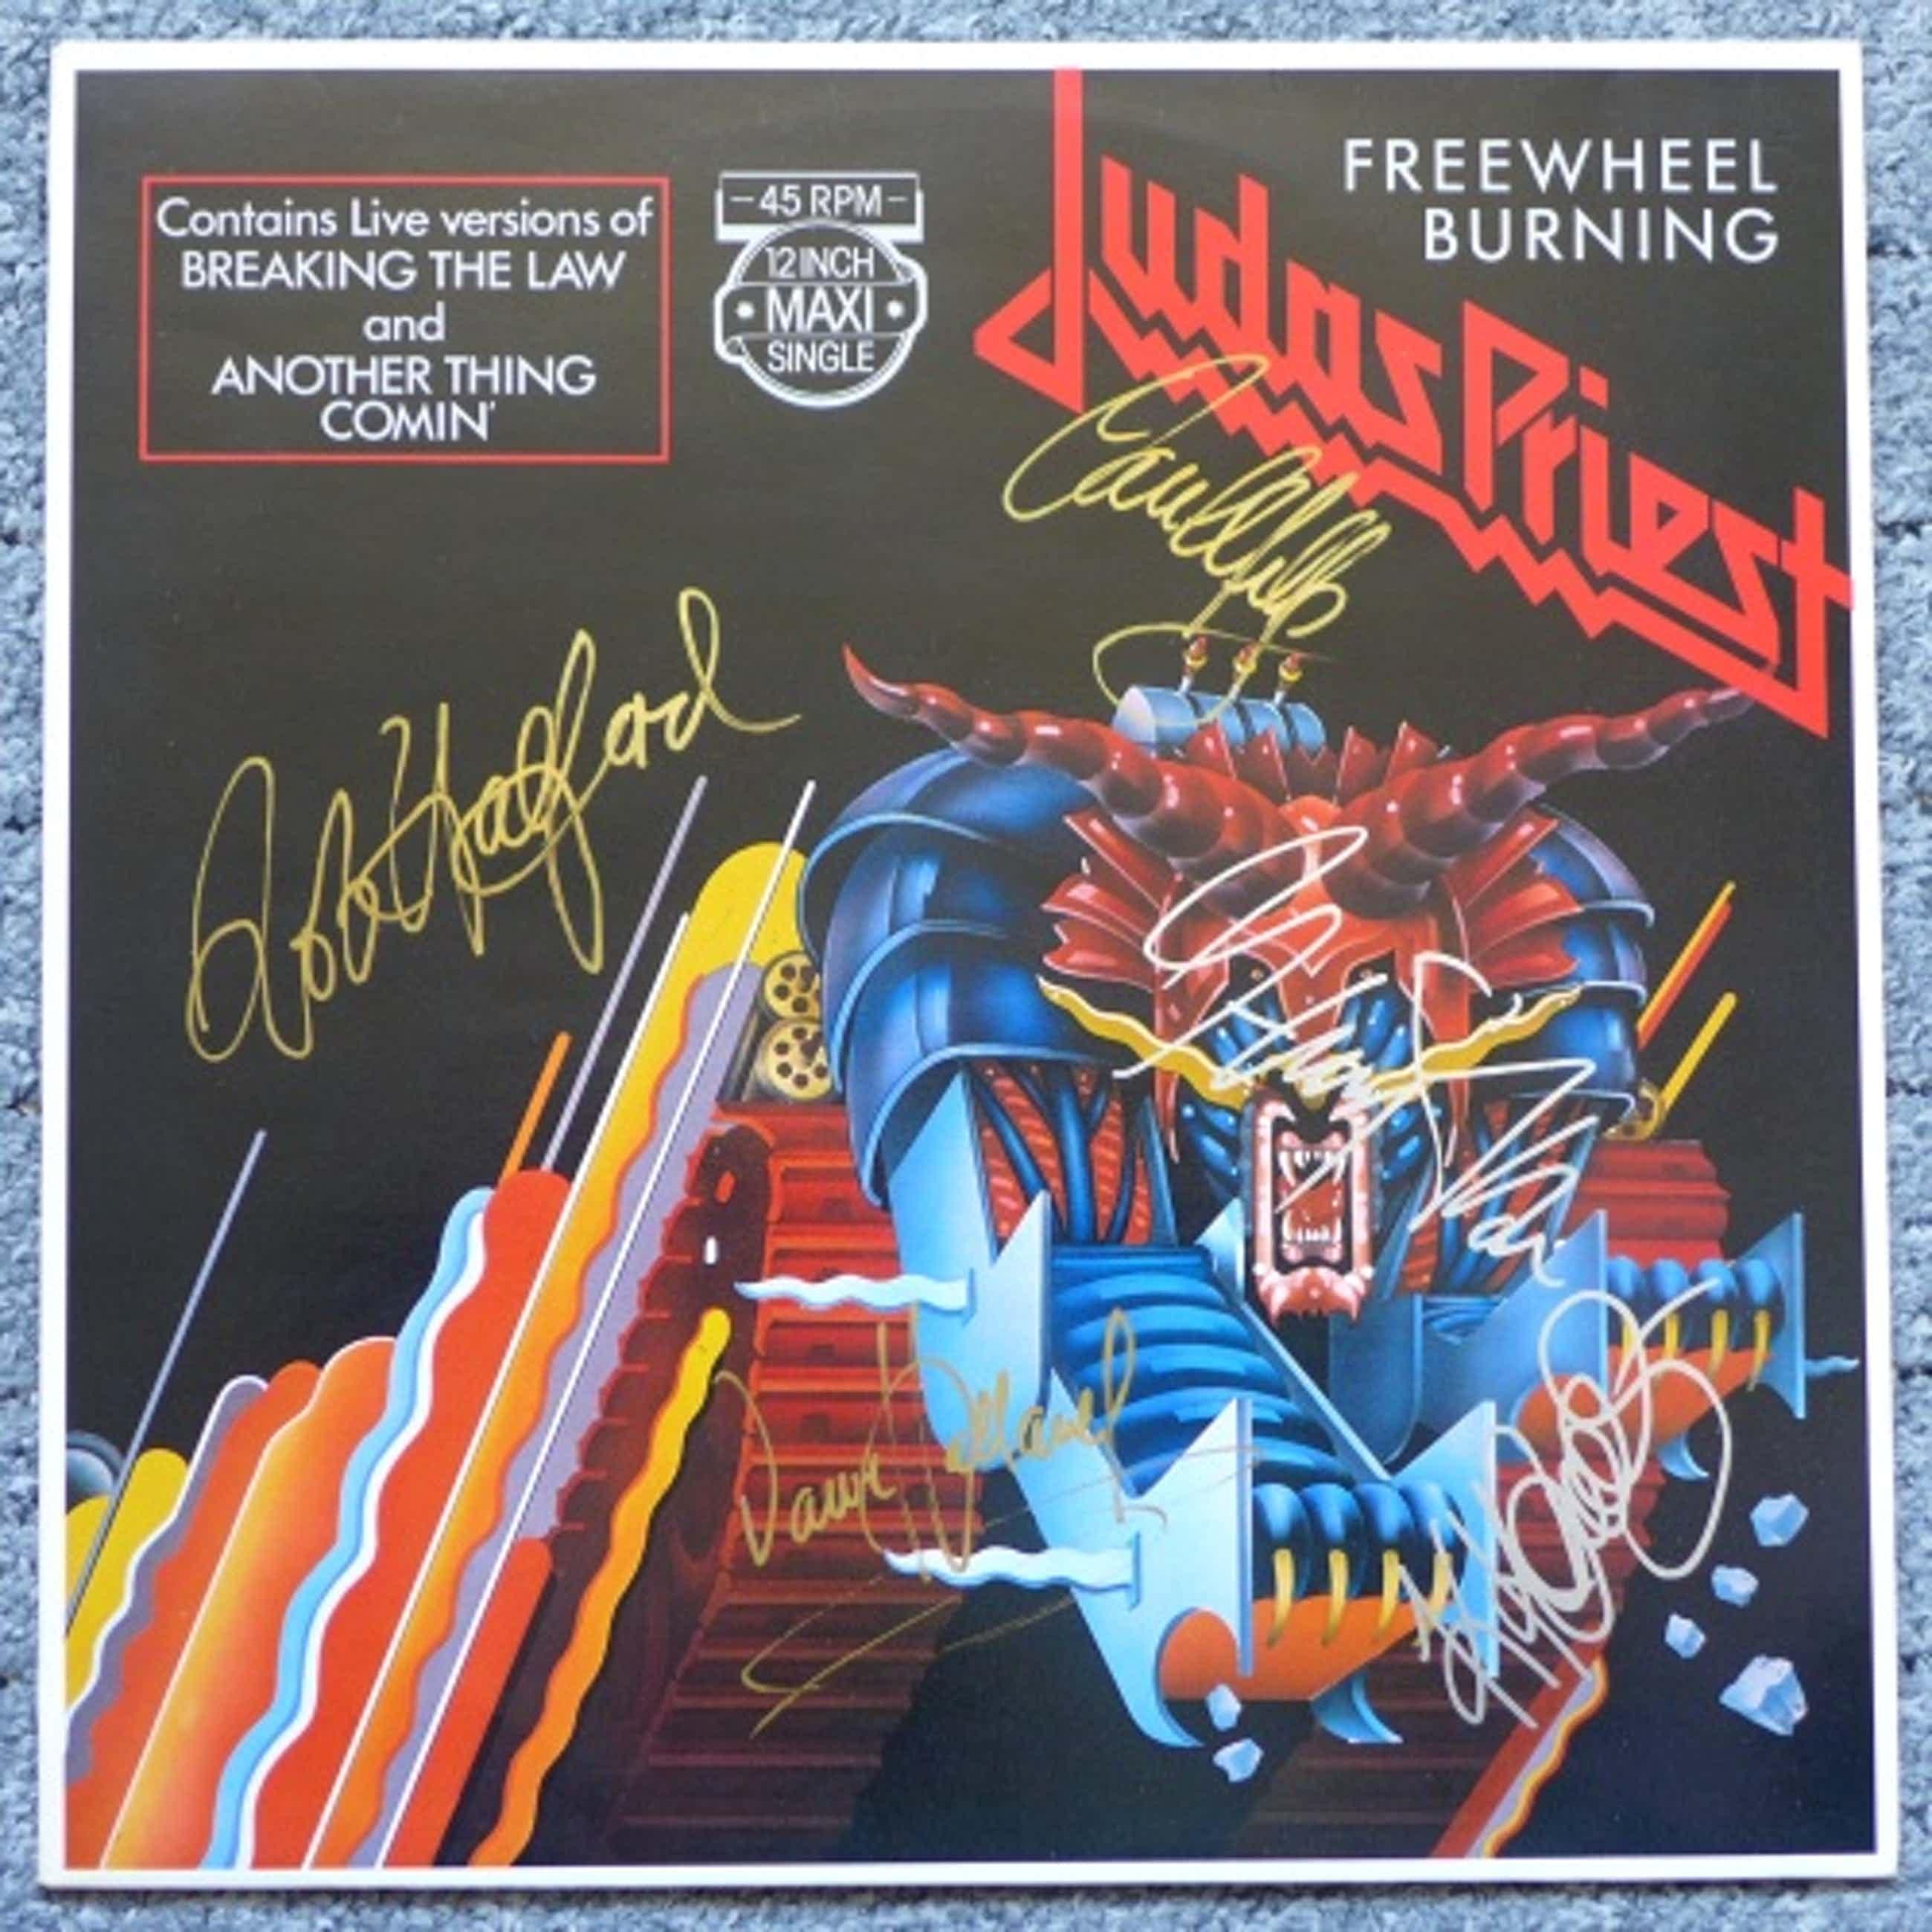 Judas Priest - Freewheel Burning, Maxi Single signiert: Halford, Tipton, Downing, Hill, Holland kopen? Bied vanaf 49!